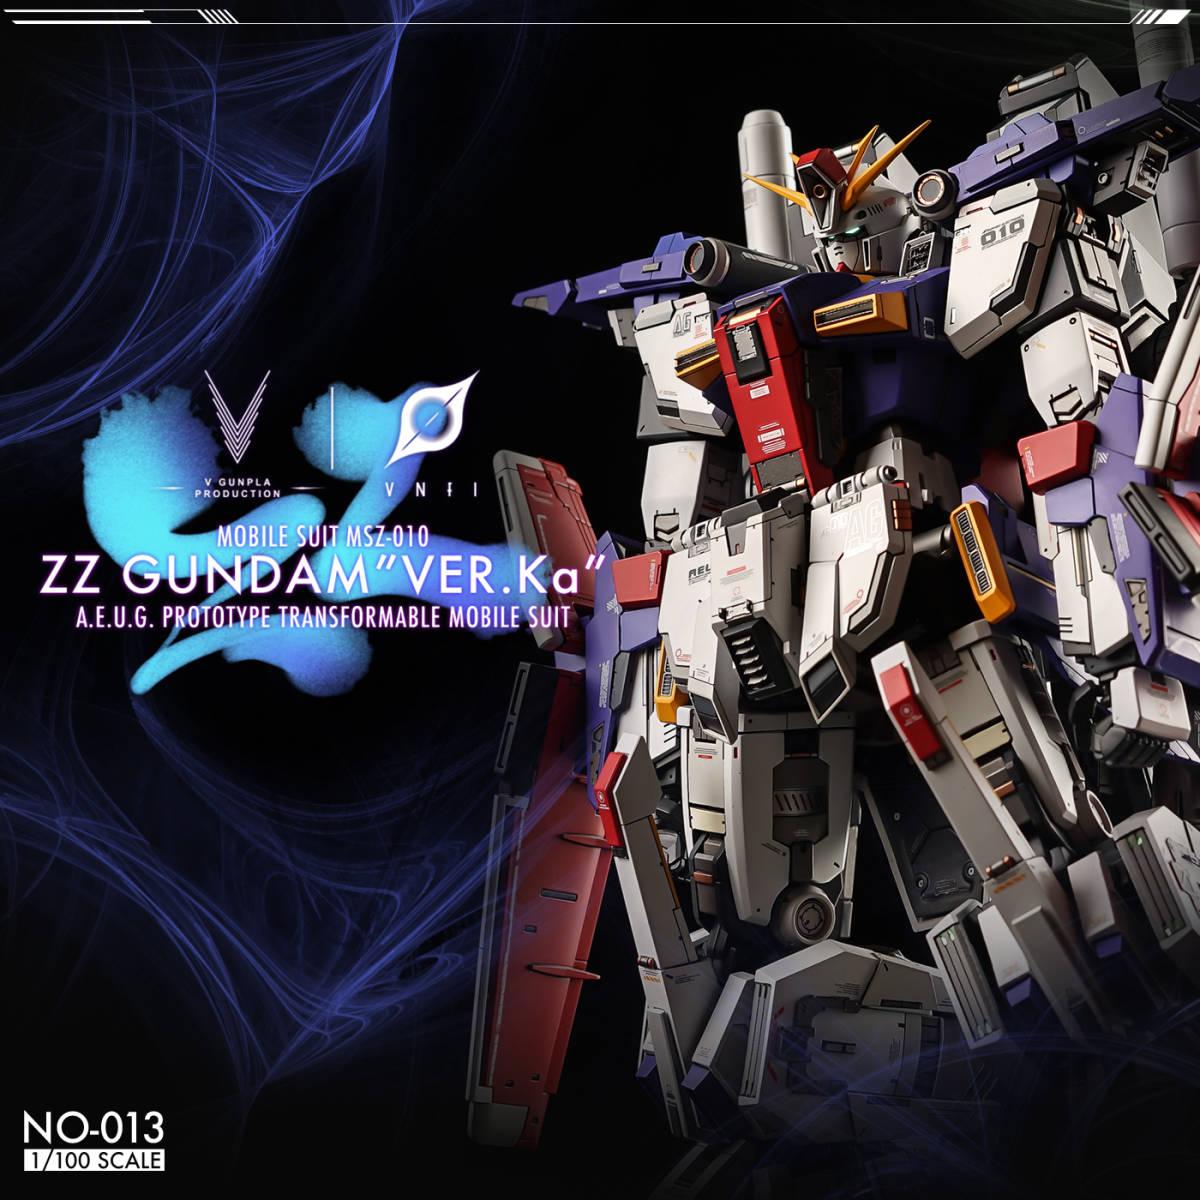 G251_Maniaic_Studio_MG_ZZ_INASK_0017.jpg